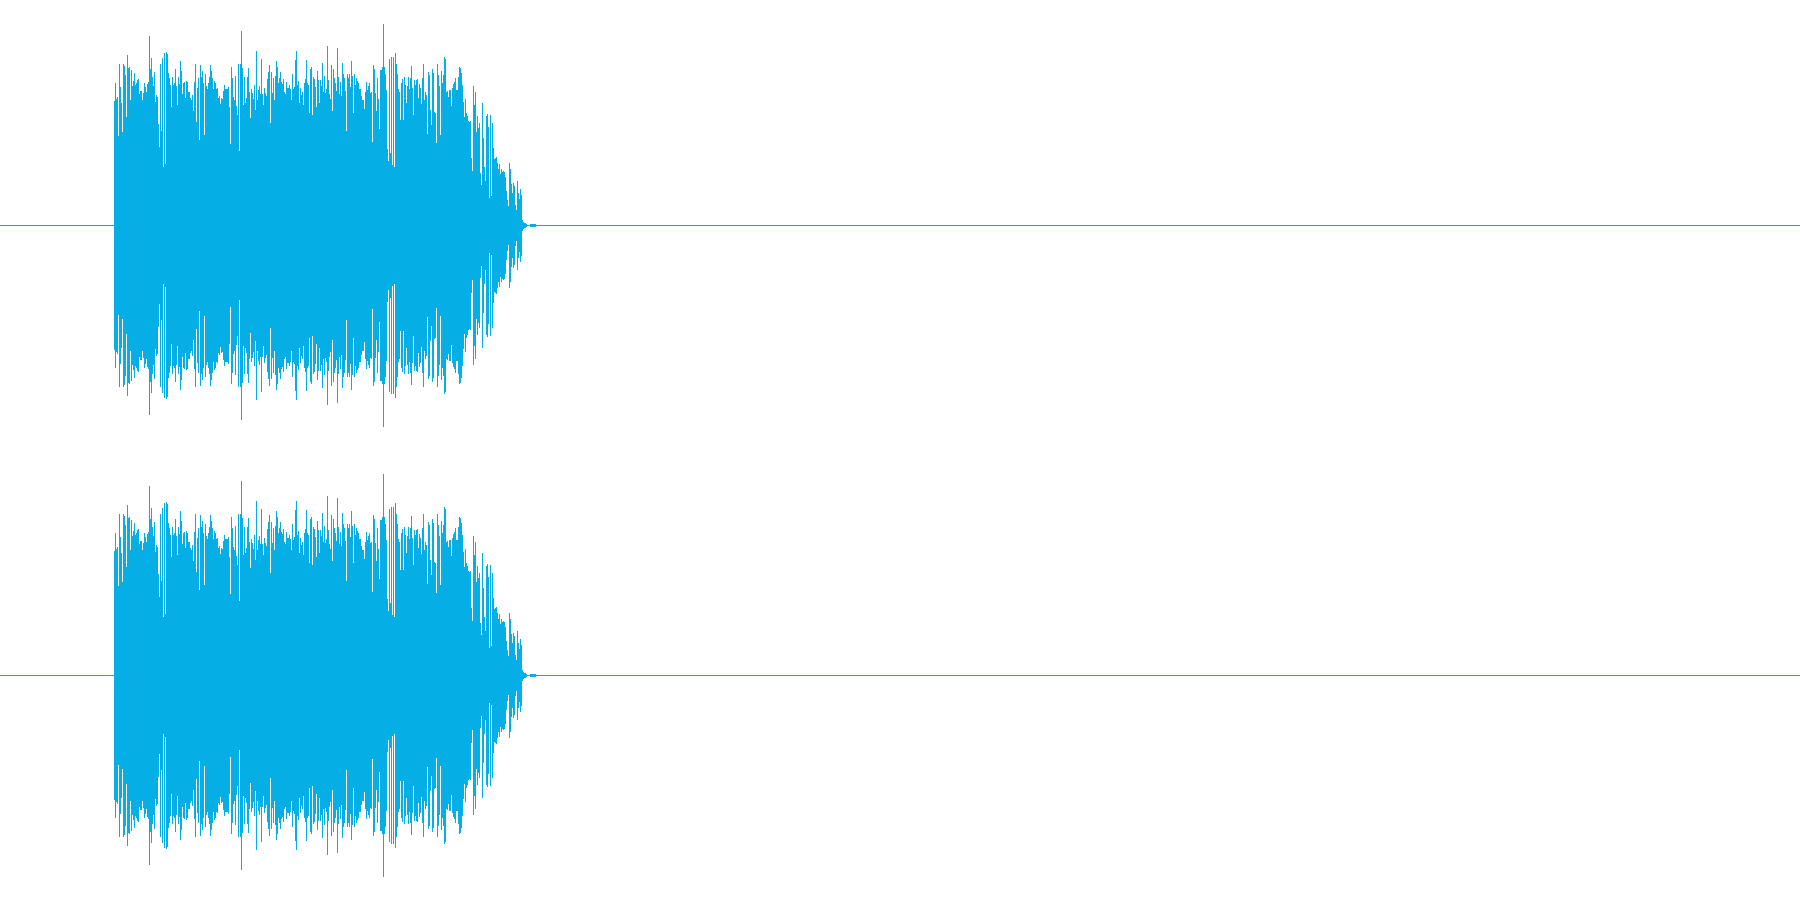 【GB 格闘01-09(攻撃)】 の再生済みの波形